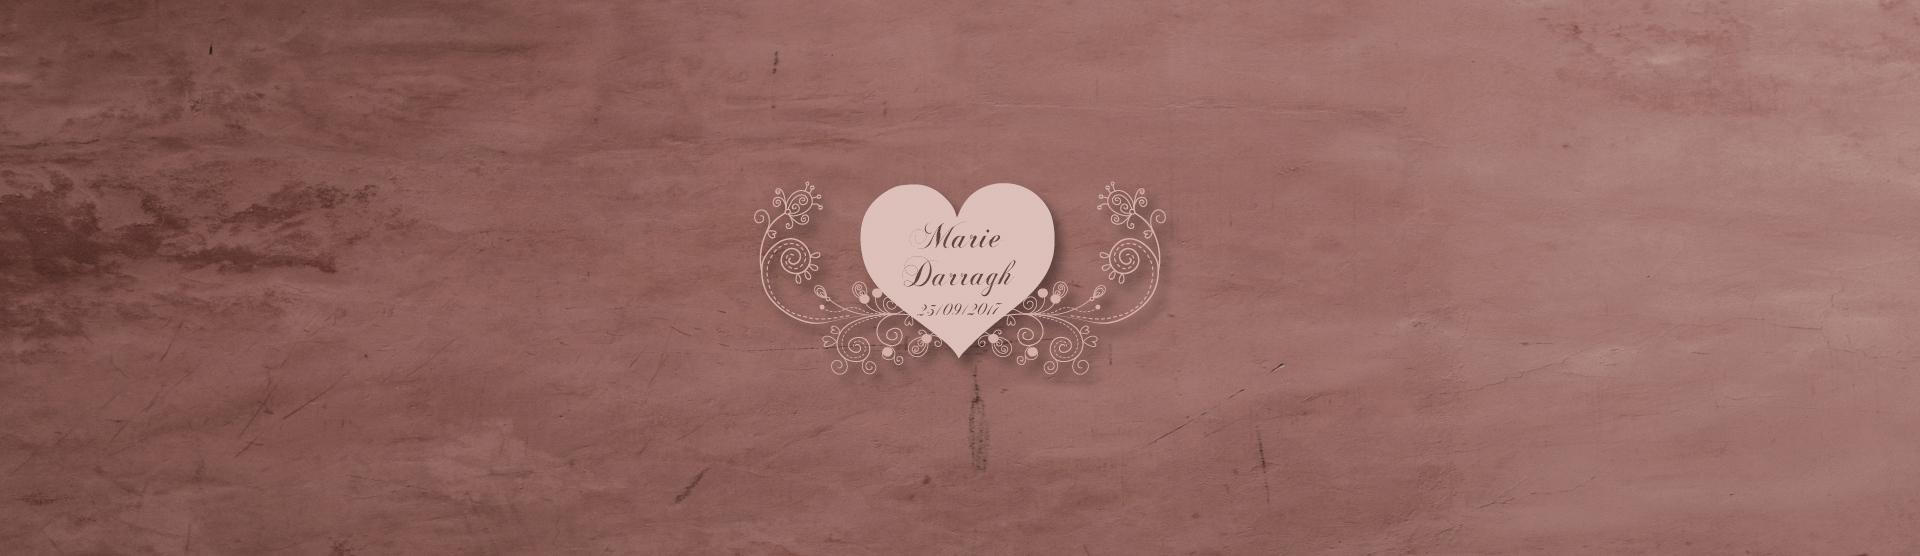 wedding invite design   Graphic Design   The Design Girls